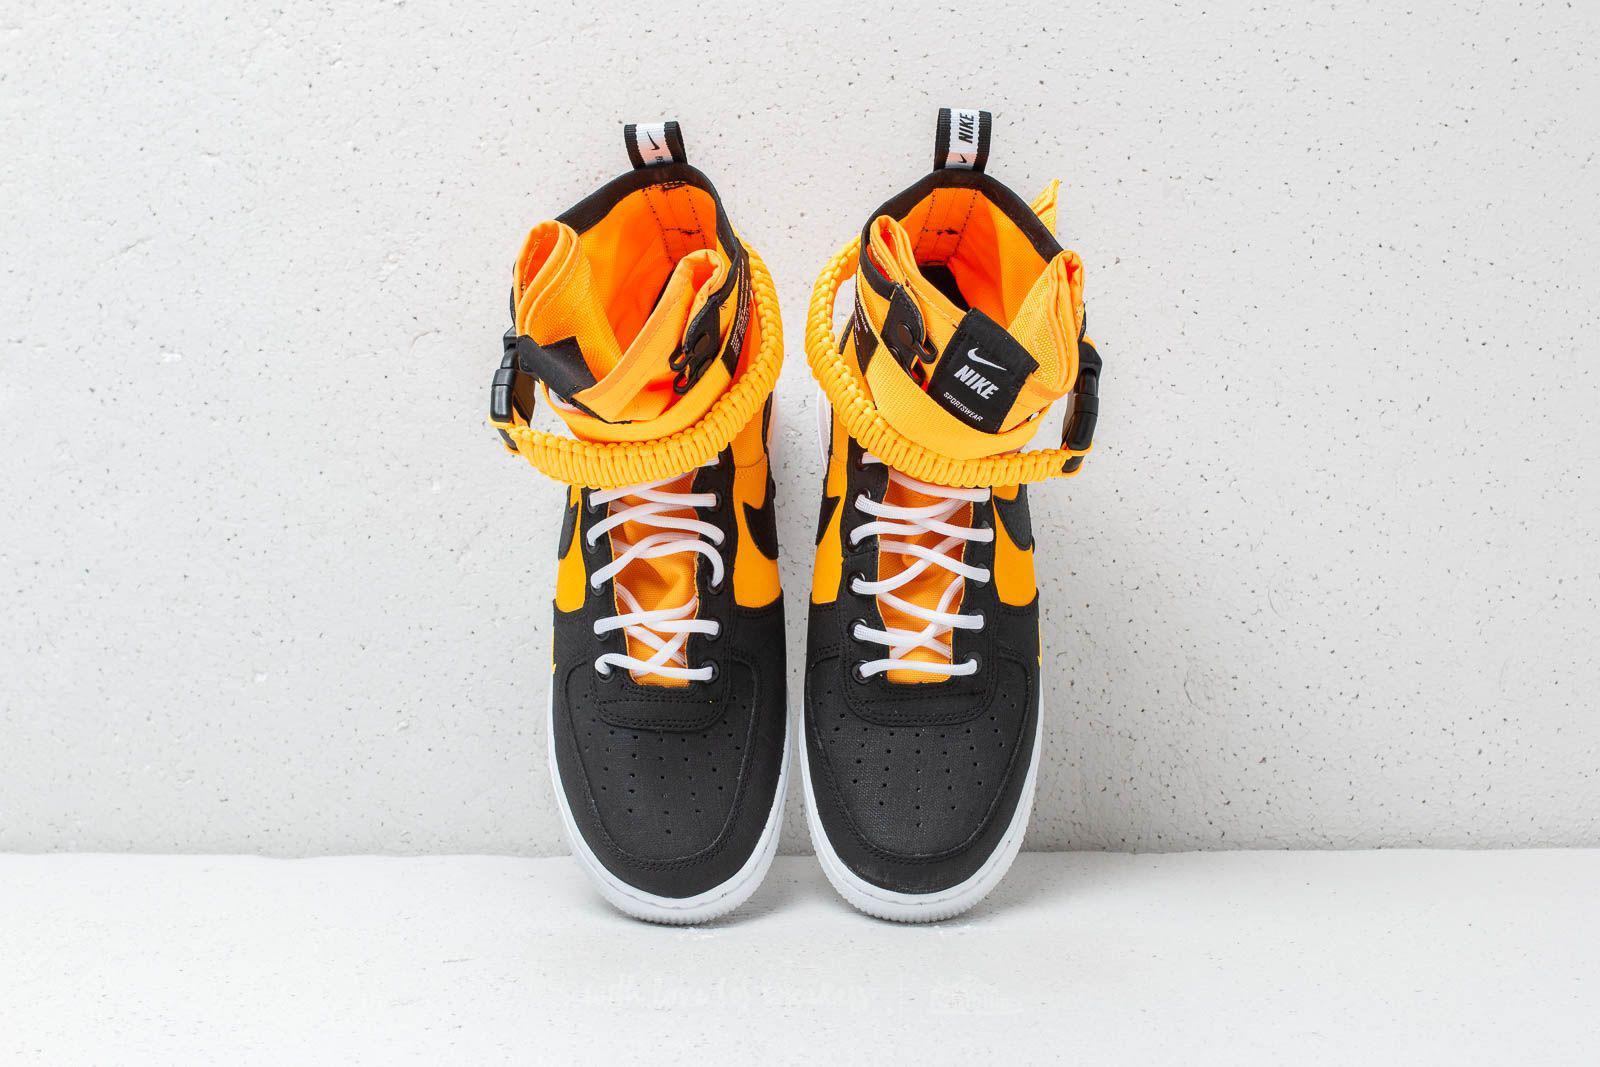 Nike Rubber Sf Air Force 1 Laser Orange/ Black-white High-top ...